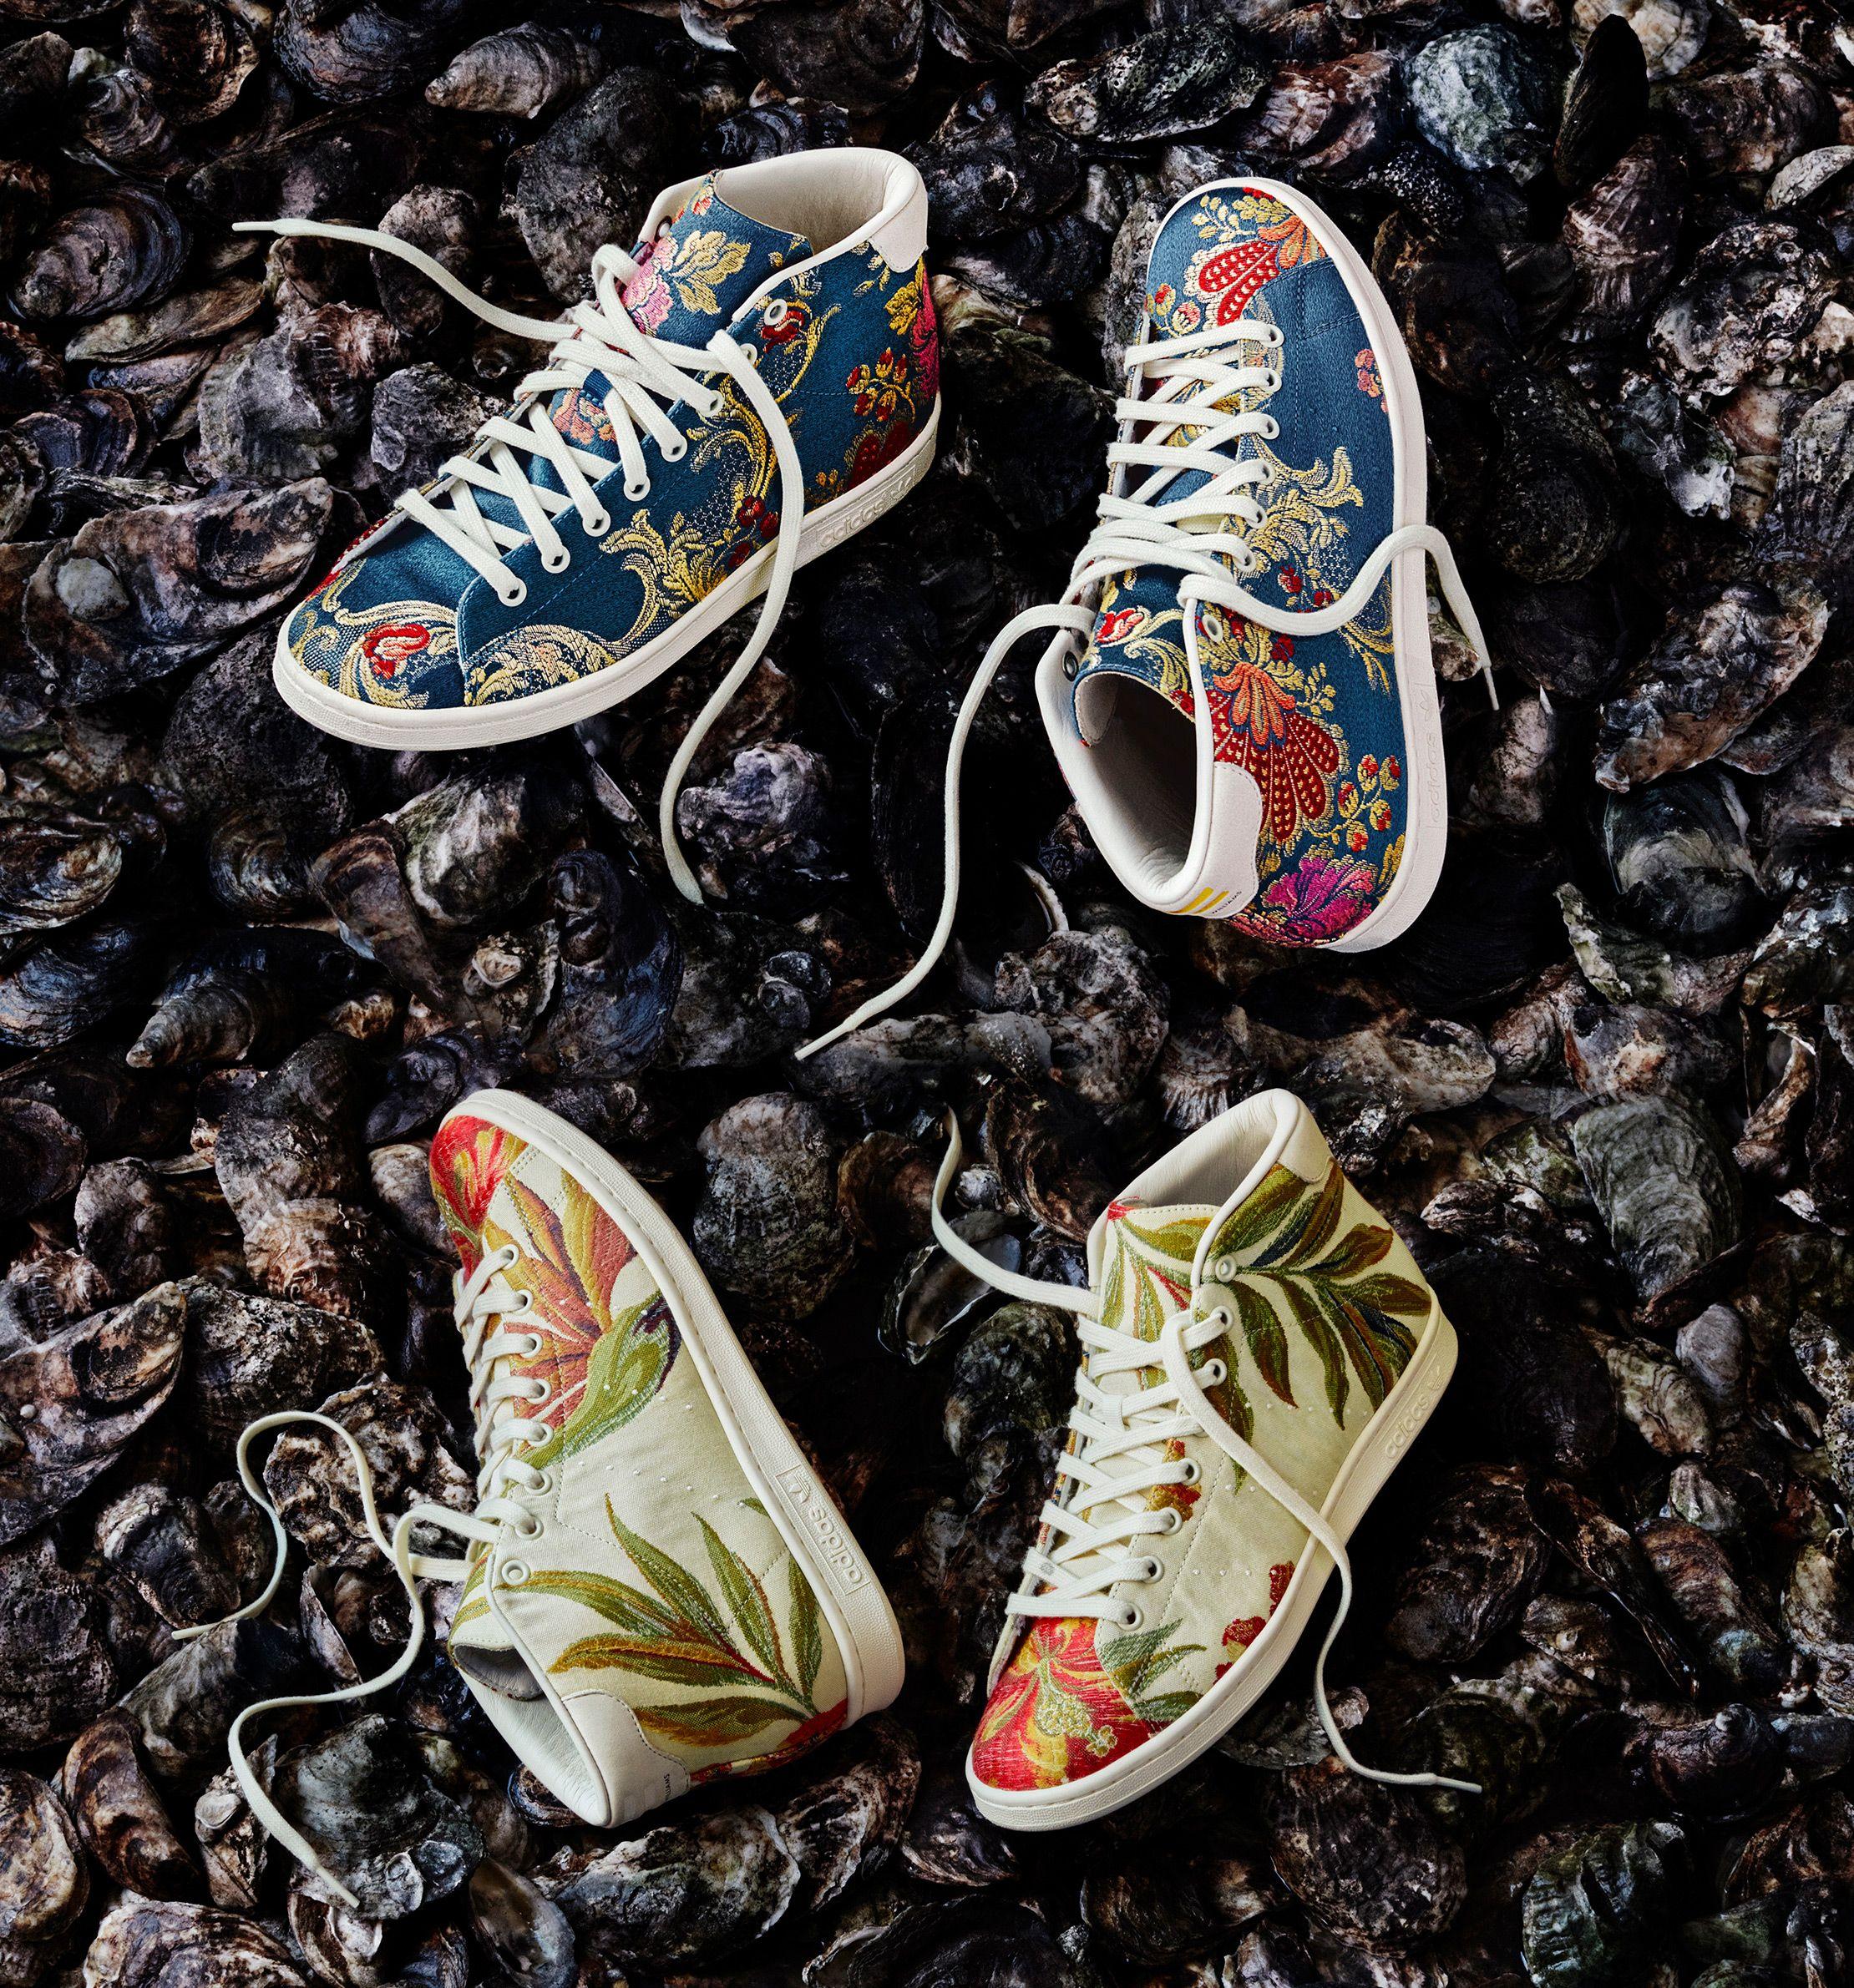 Air Jordan 22 Combinaciones De Colores De Hilo UUxppti